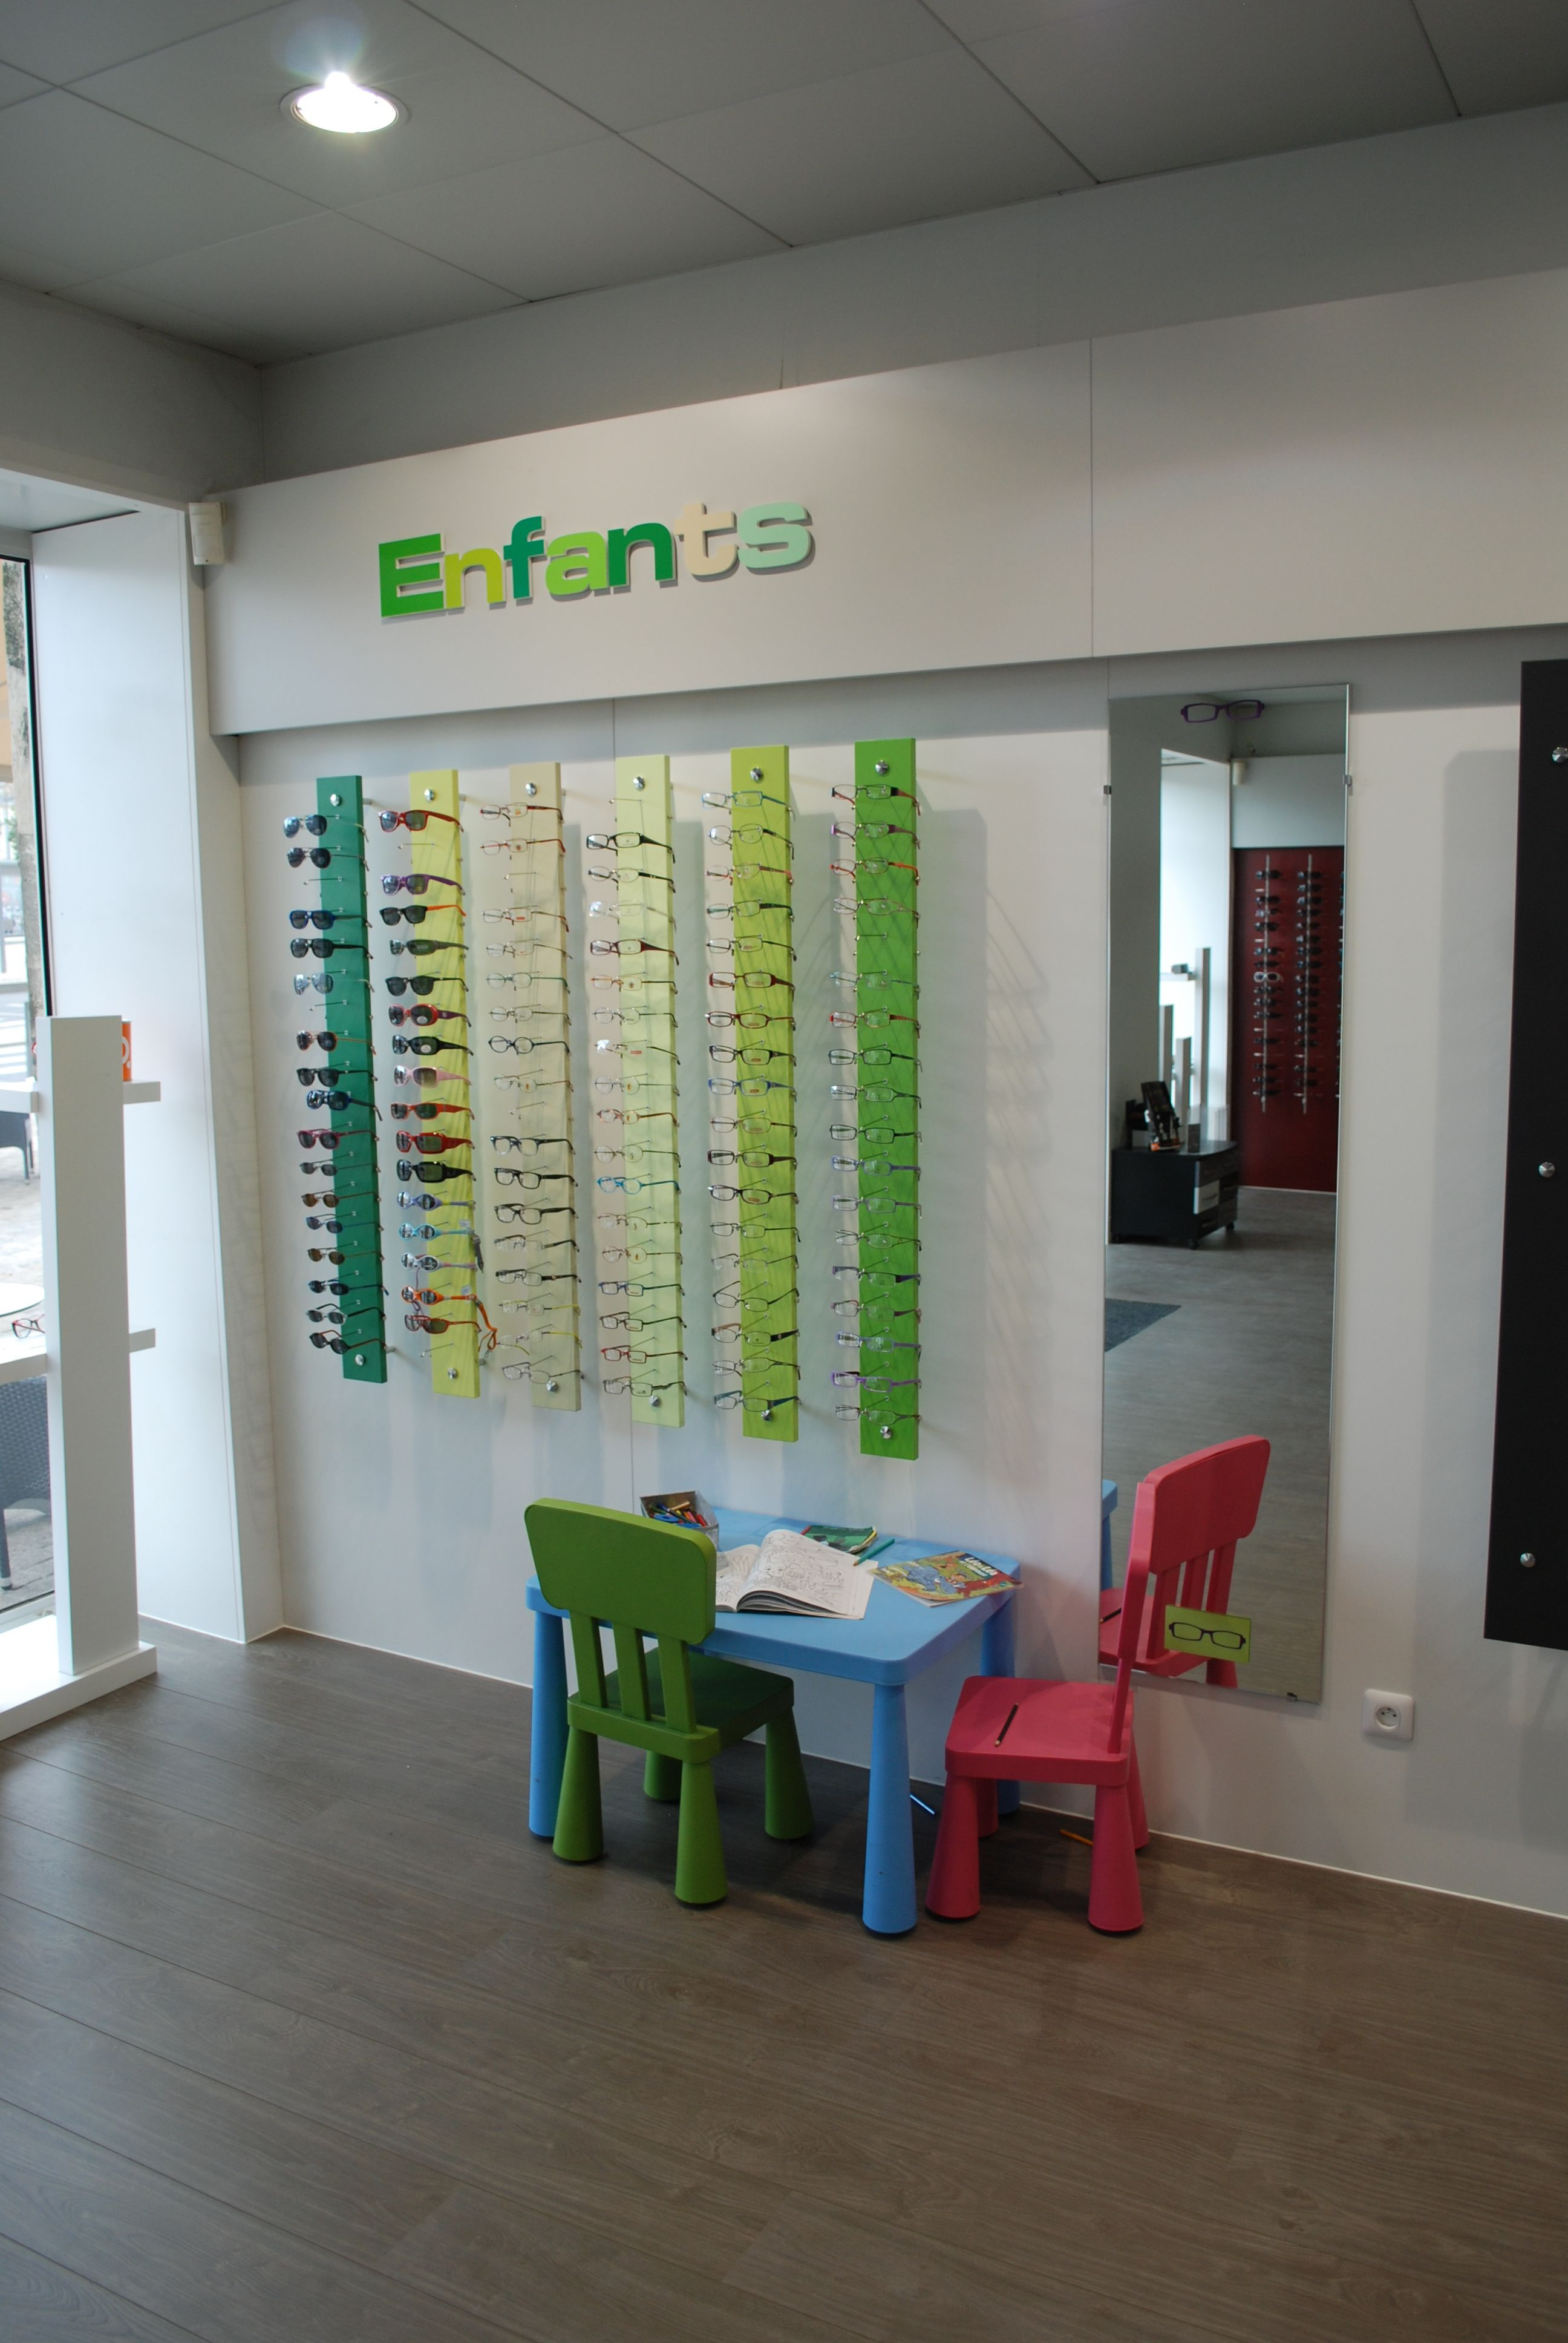 showroom optique jcda agencement du magasin d 39 optique les lunettes de jules 33 espace enfant. Black Bedroom Furniture Sets. Home Design Ideas